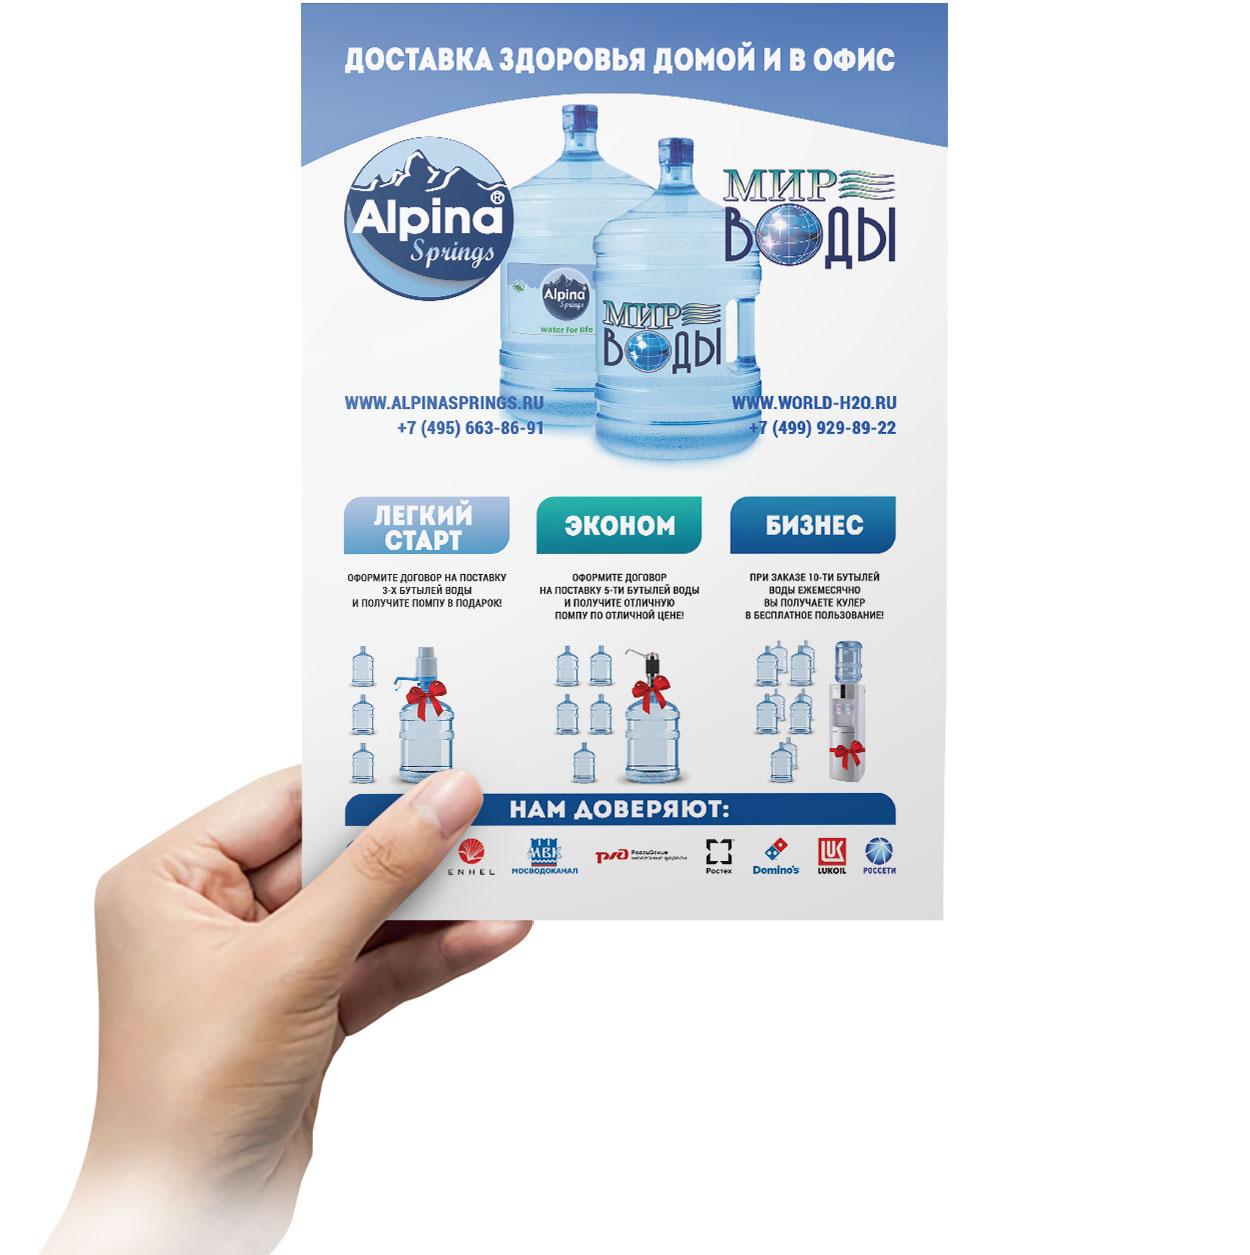 Флаер А5 для «Мир Воды»